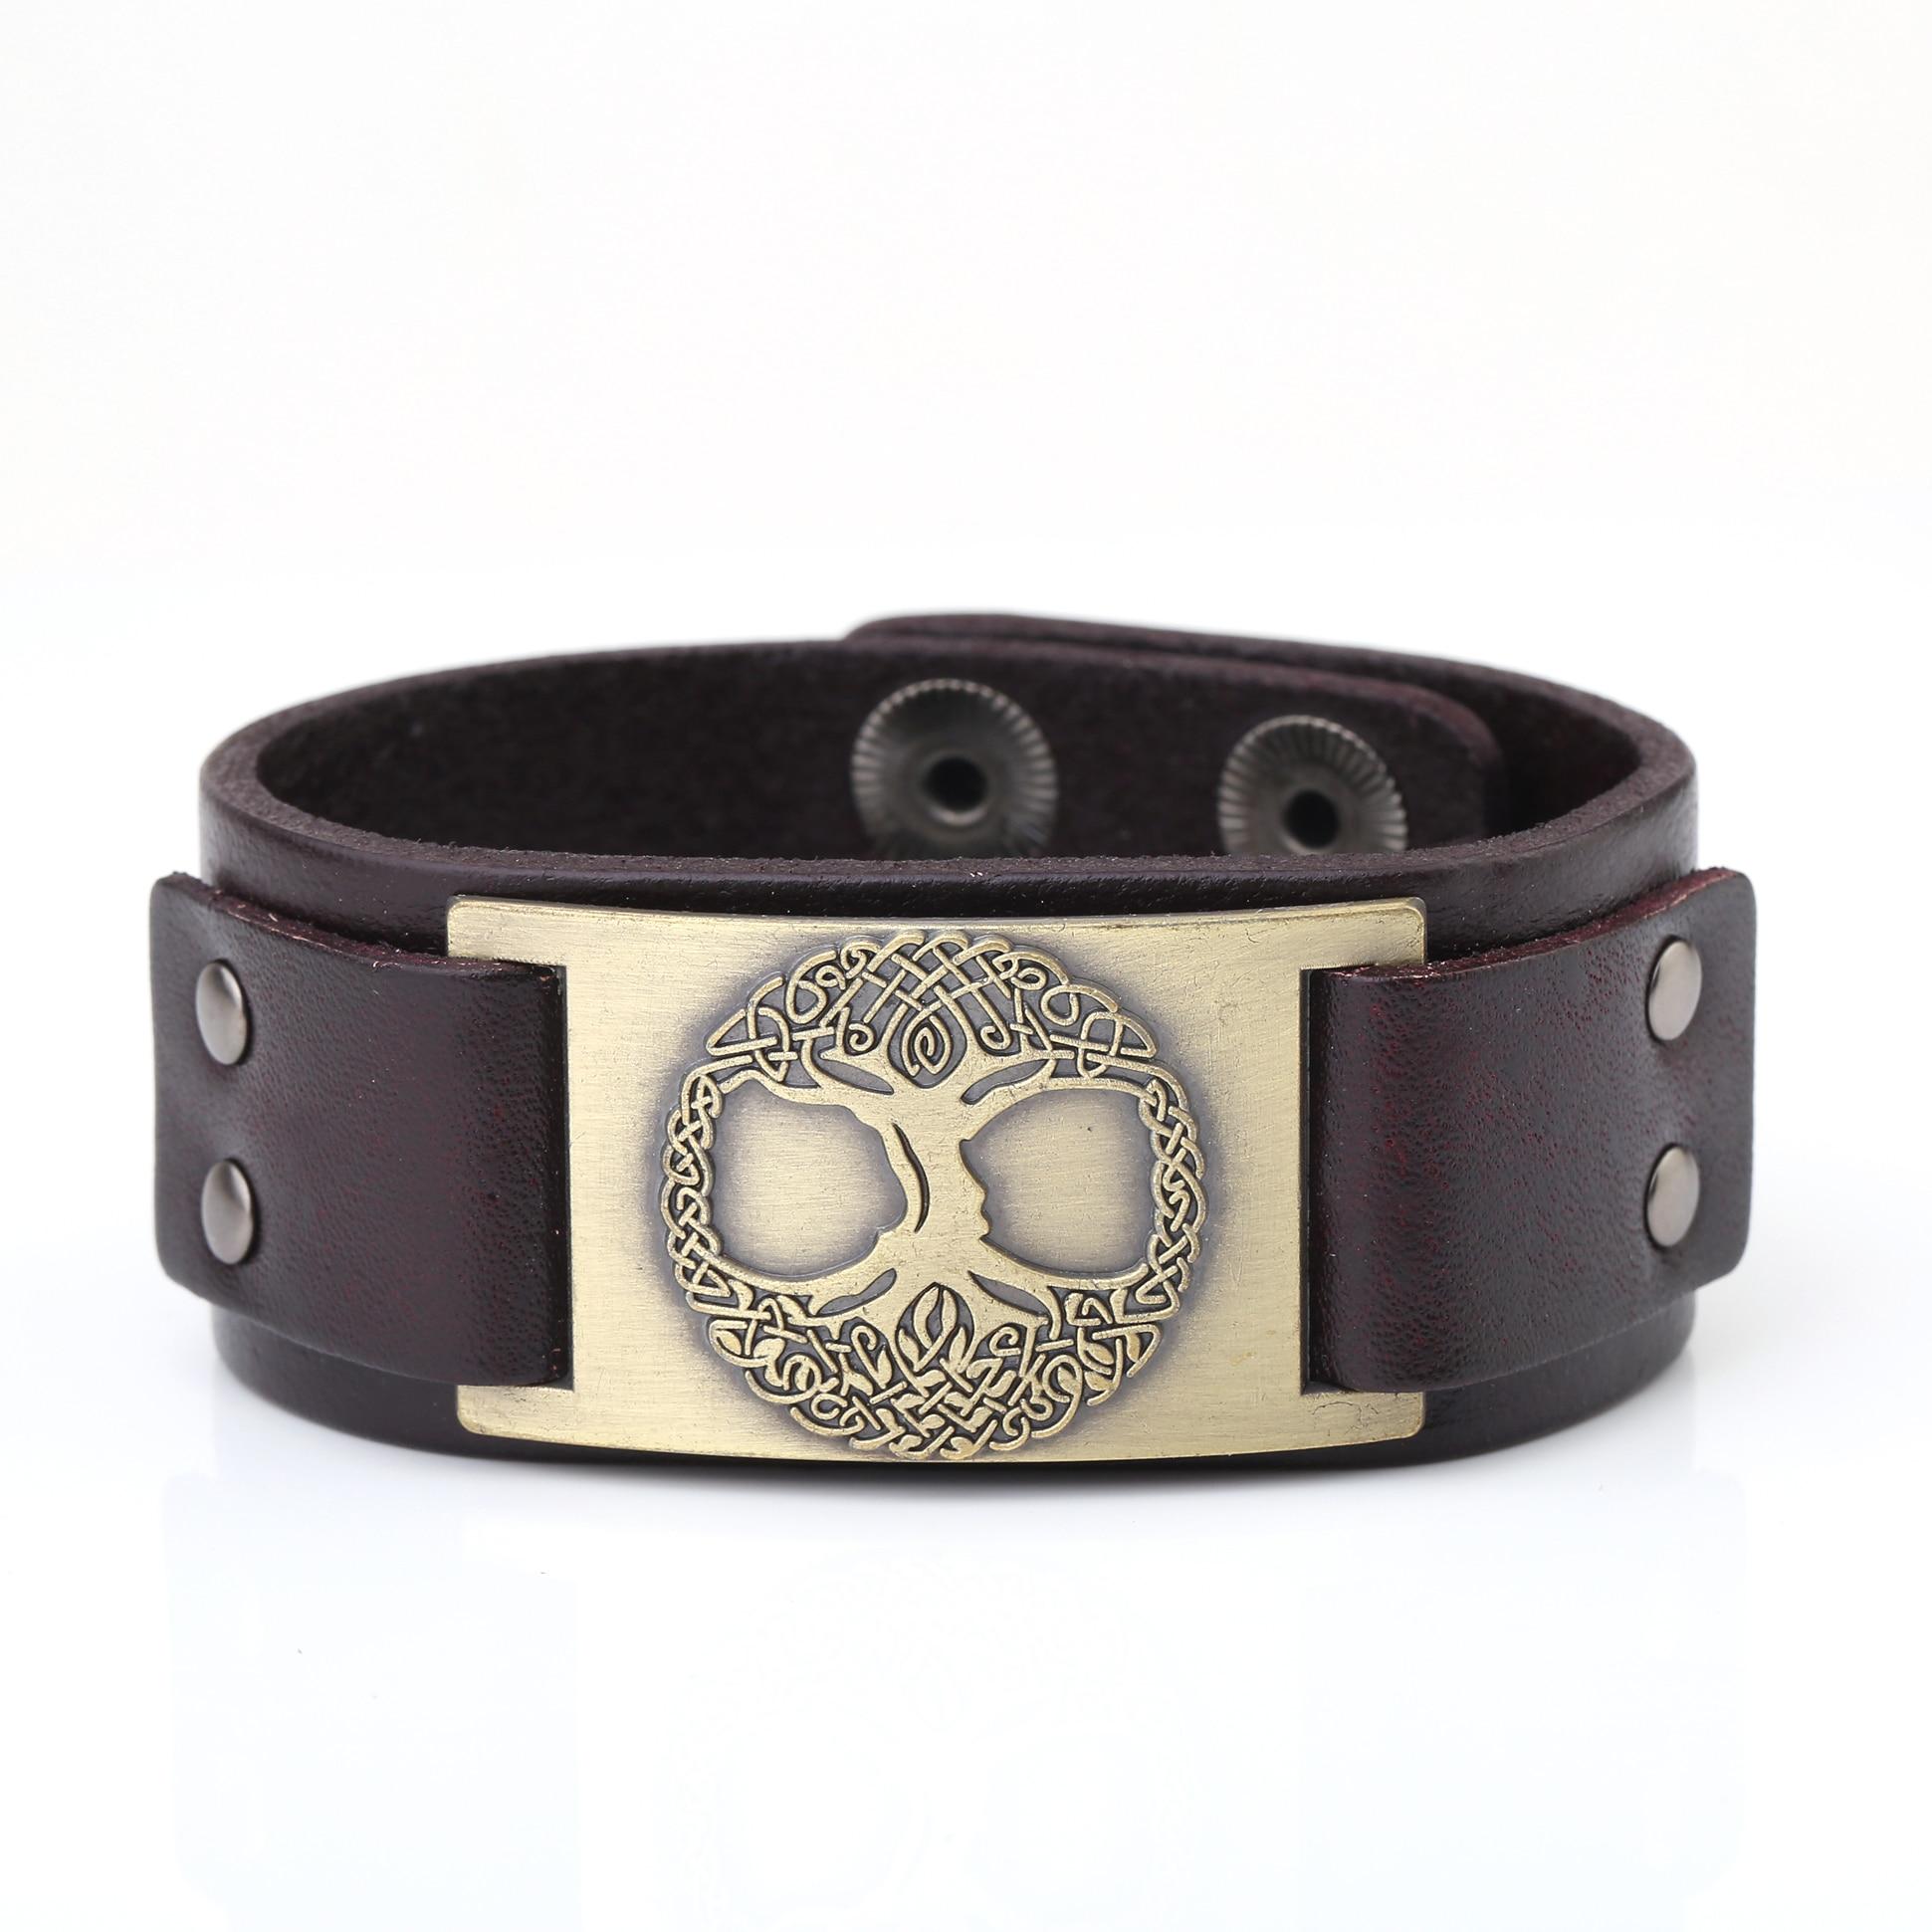 Bracelet en cuir arbre de vie  17